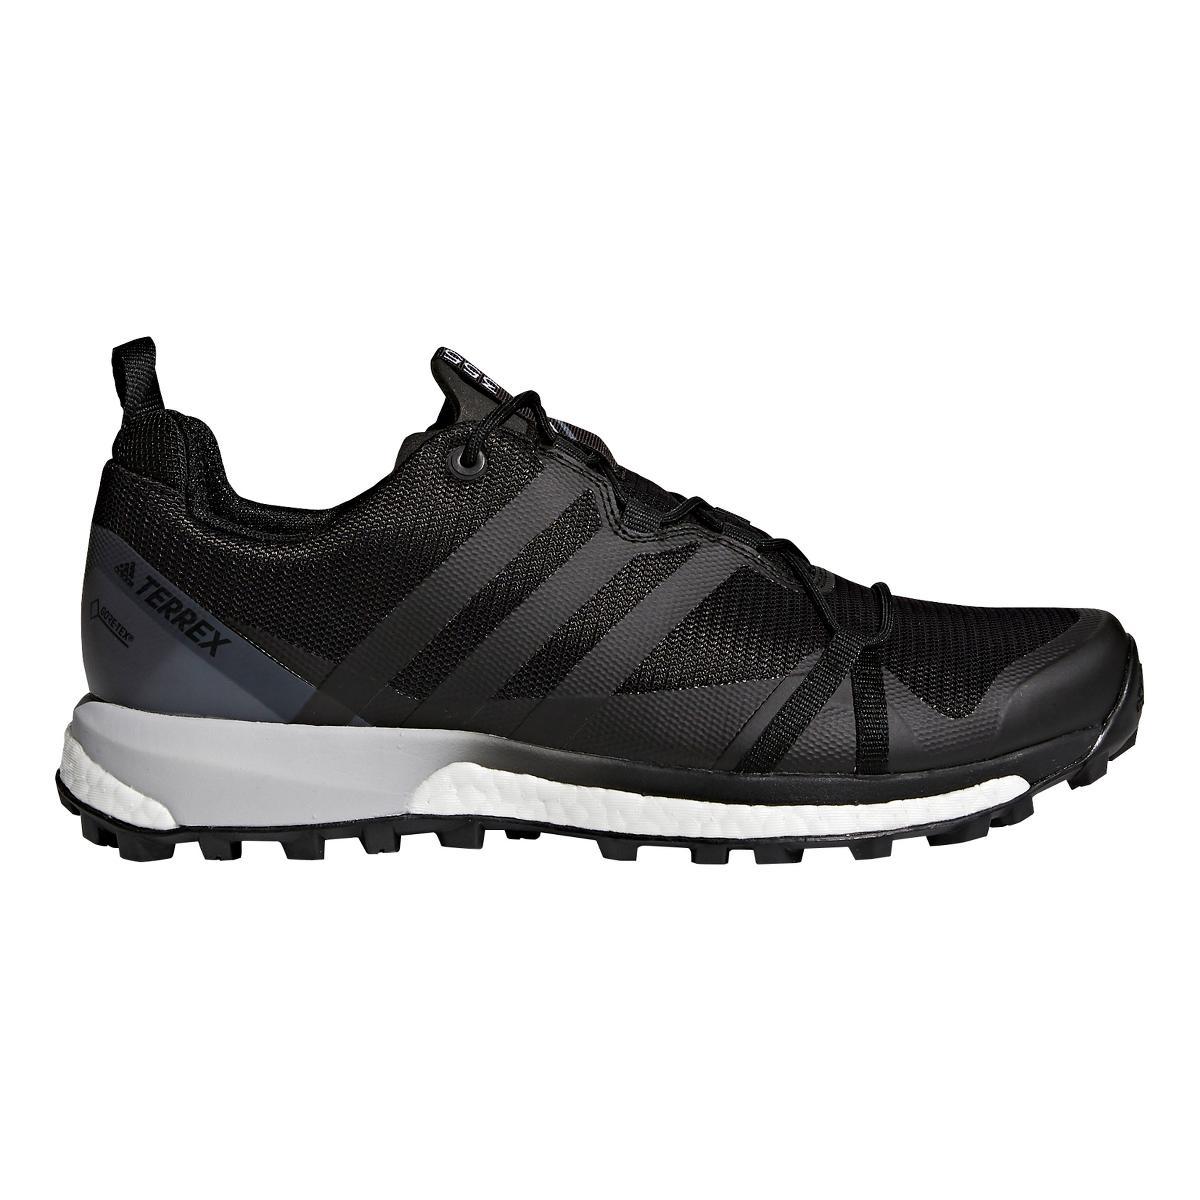 Mens adidas Terrex Agravic GTX Trail Running Chaussure at Road Runner Sports